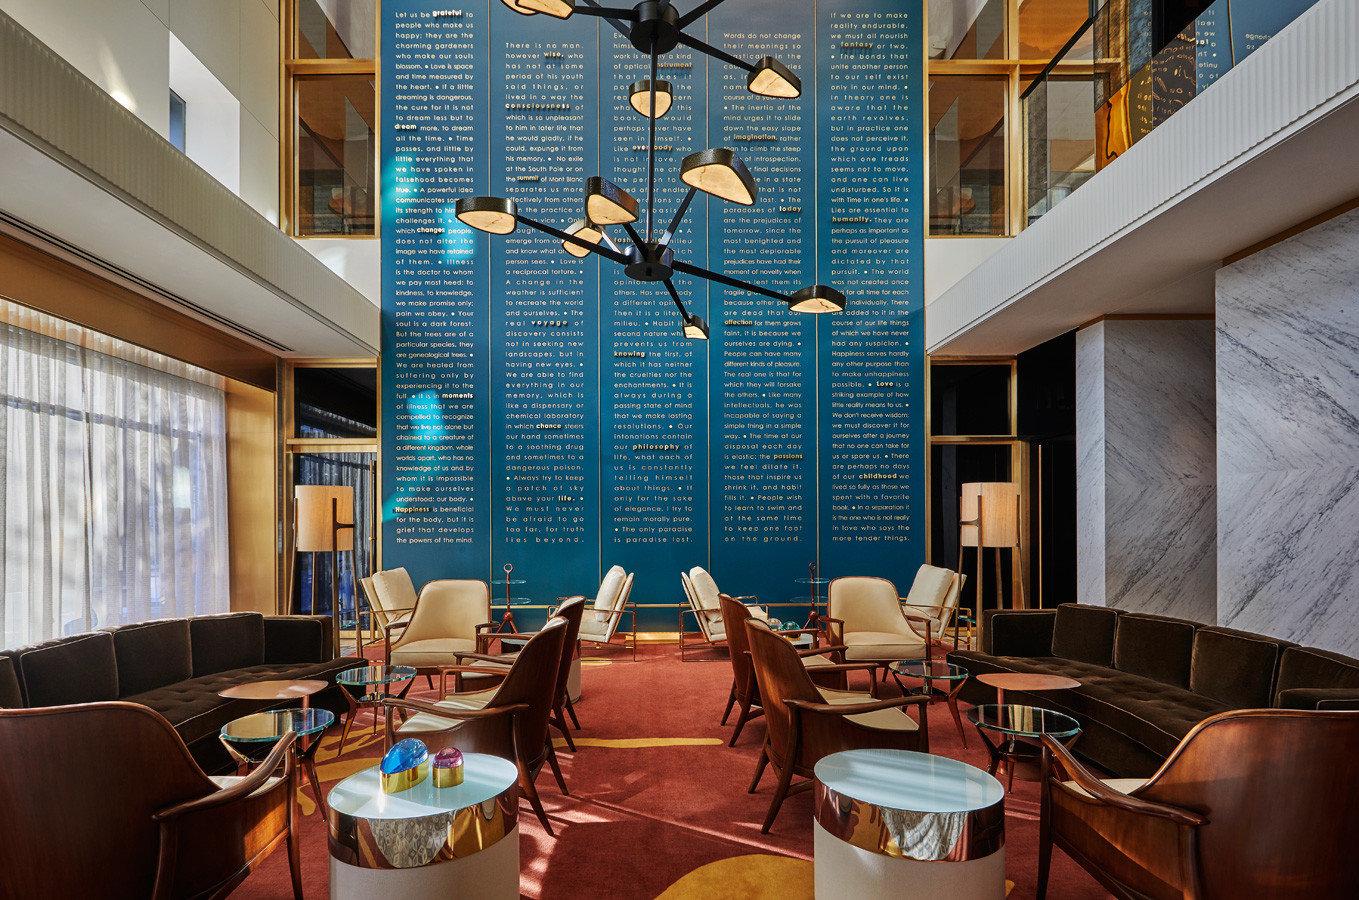 Road Trips Trip Ideas interior design restaurant Lobby apartment window